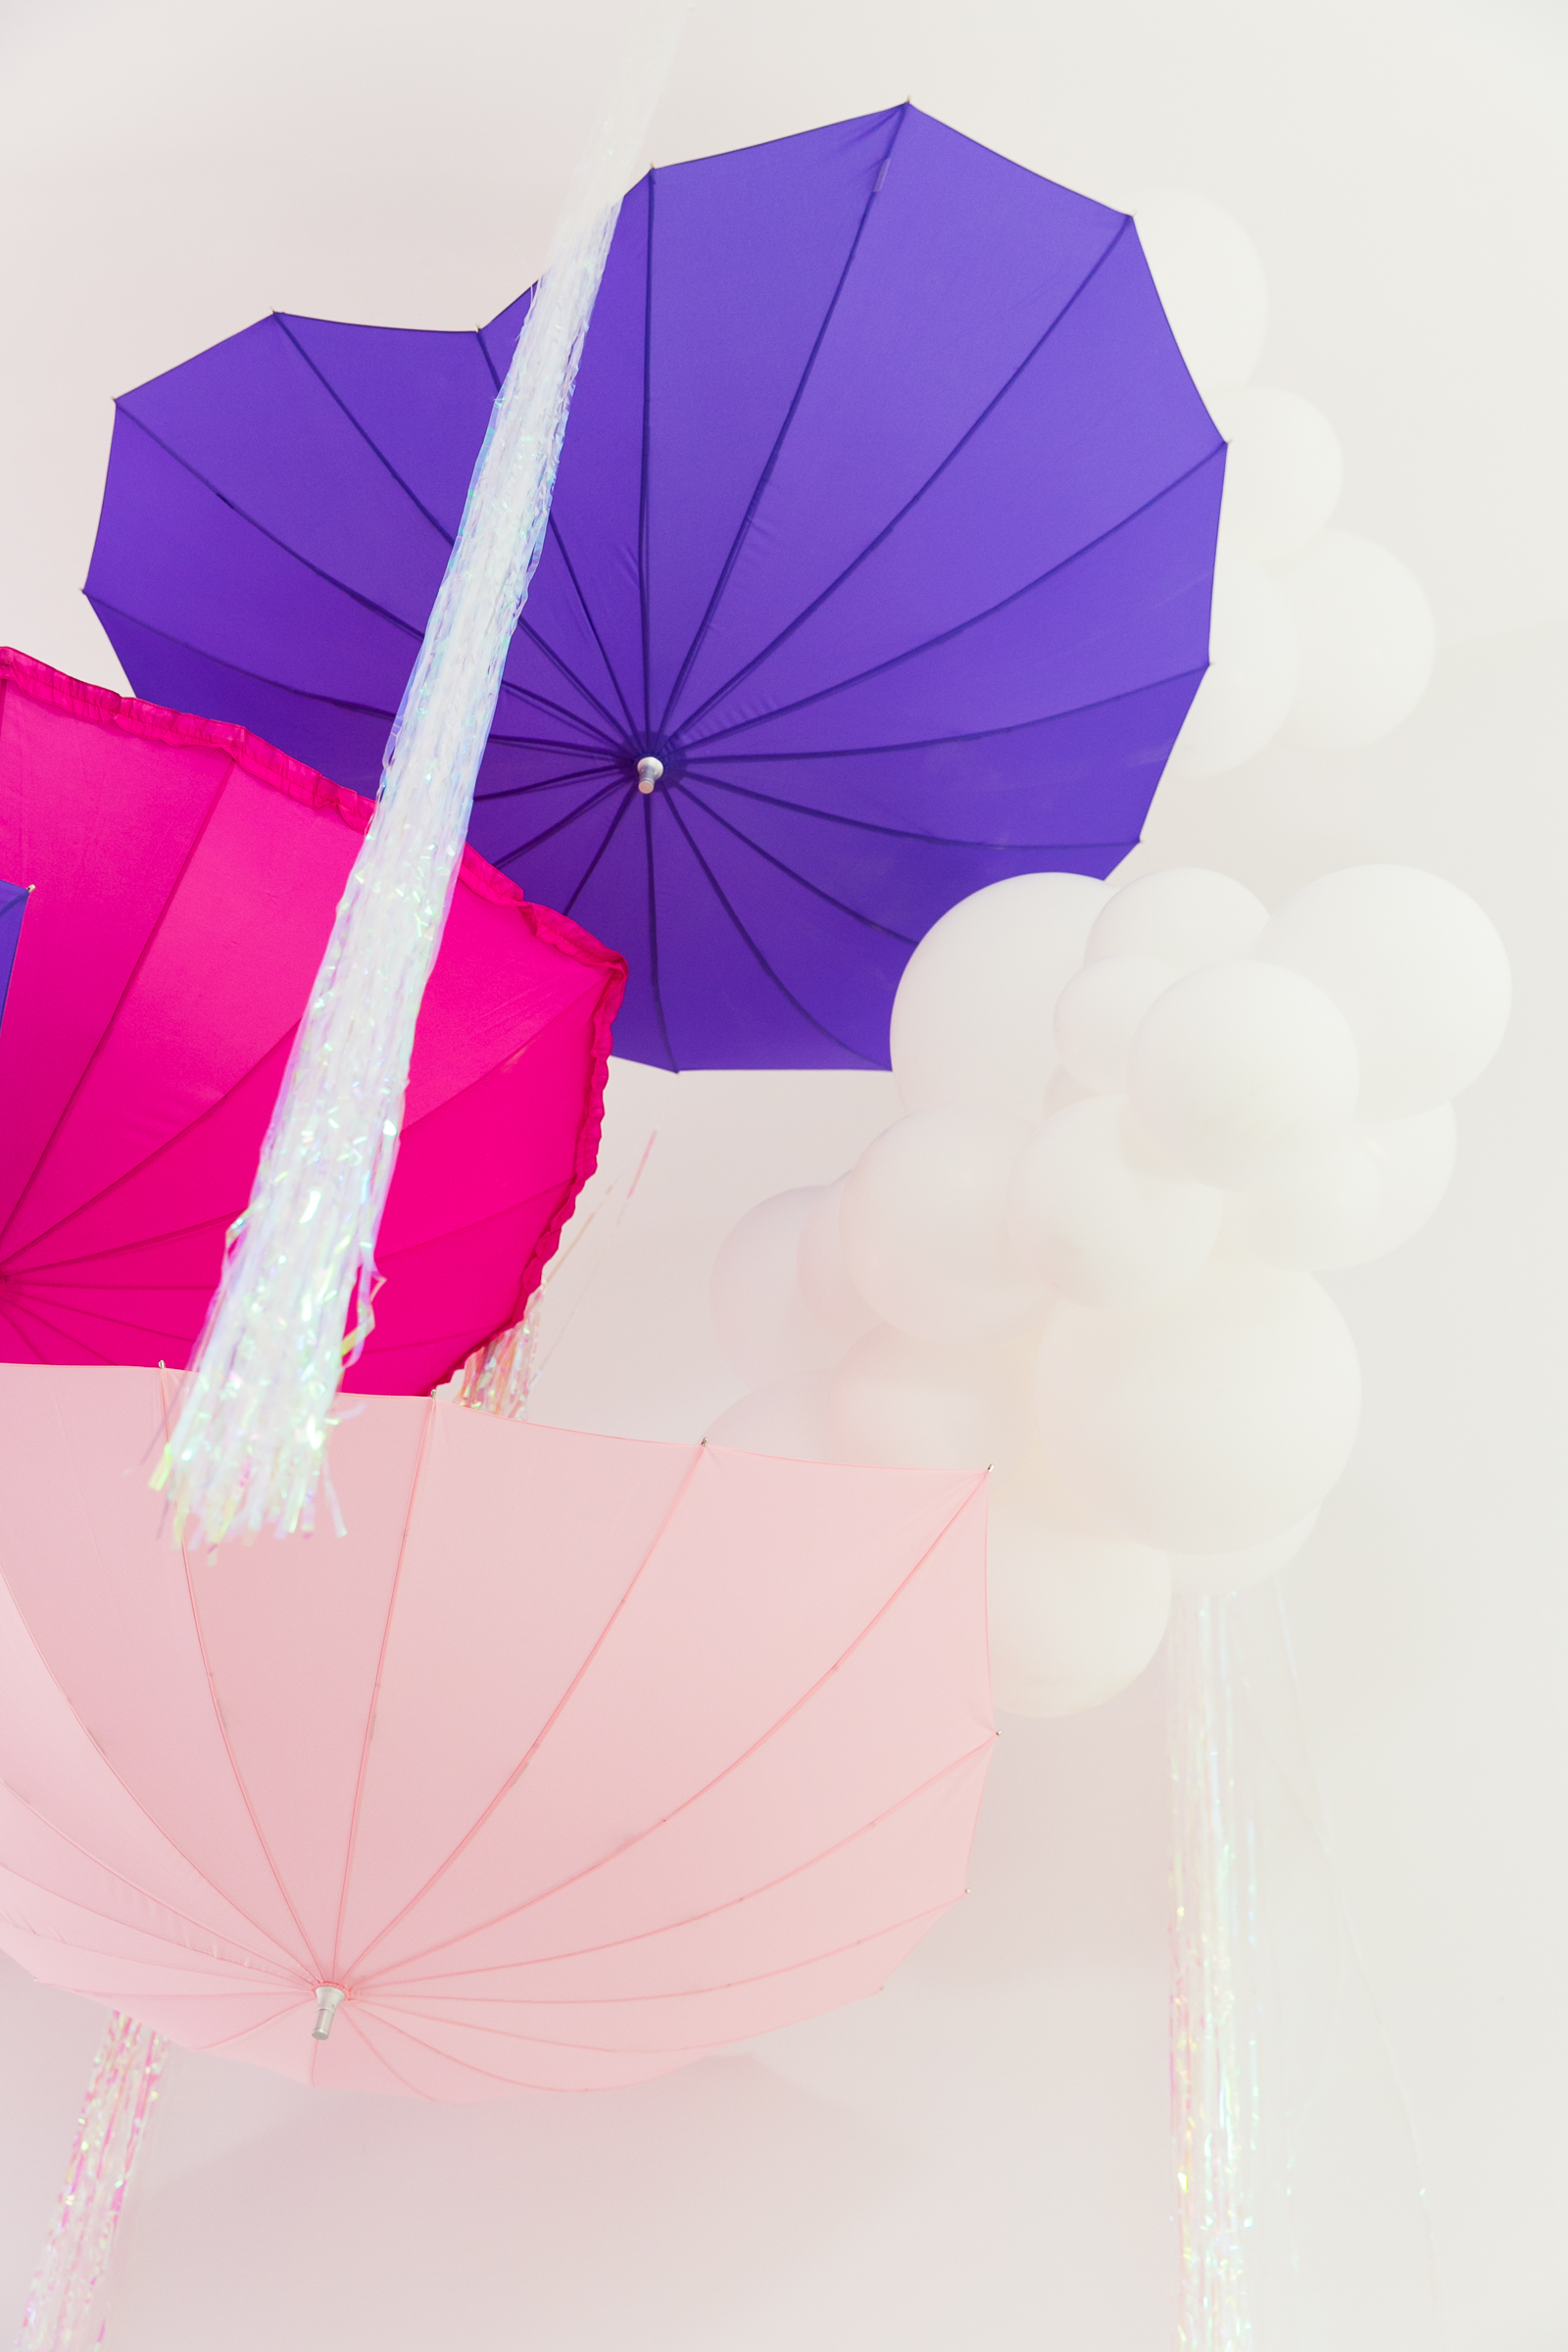 Oui Party - Peppa Pig Party - Umbrella Installation 3.jpg